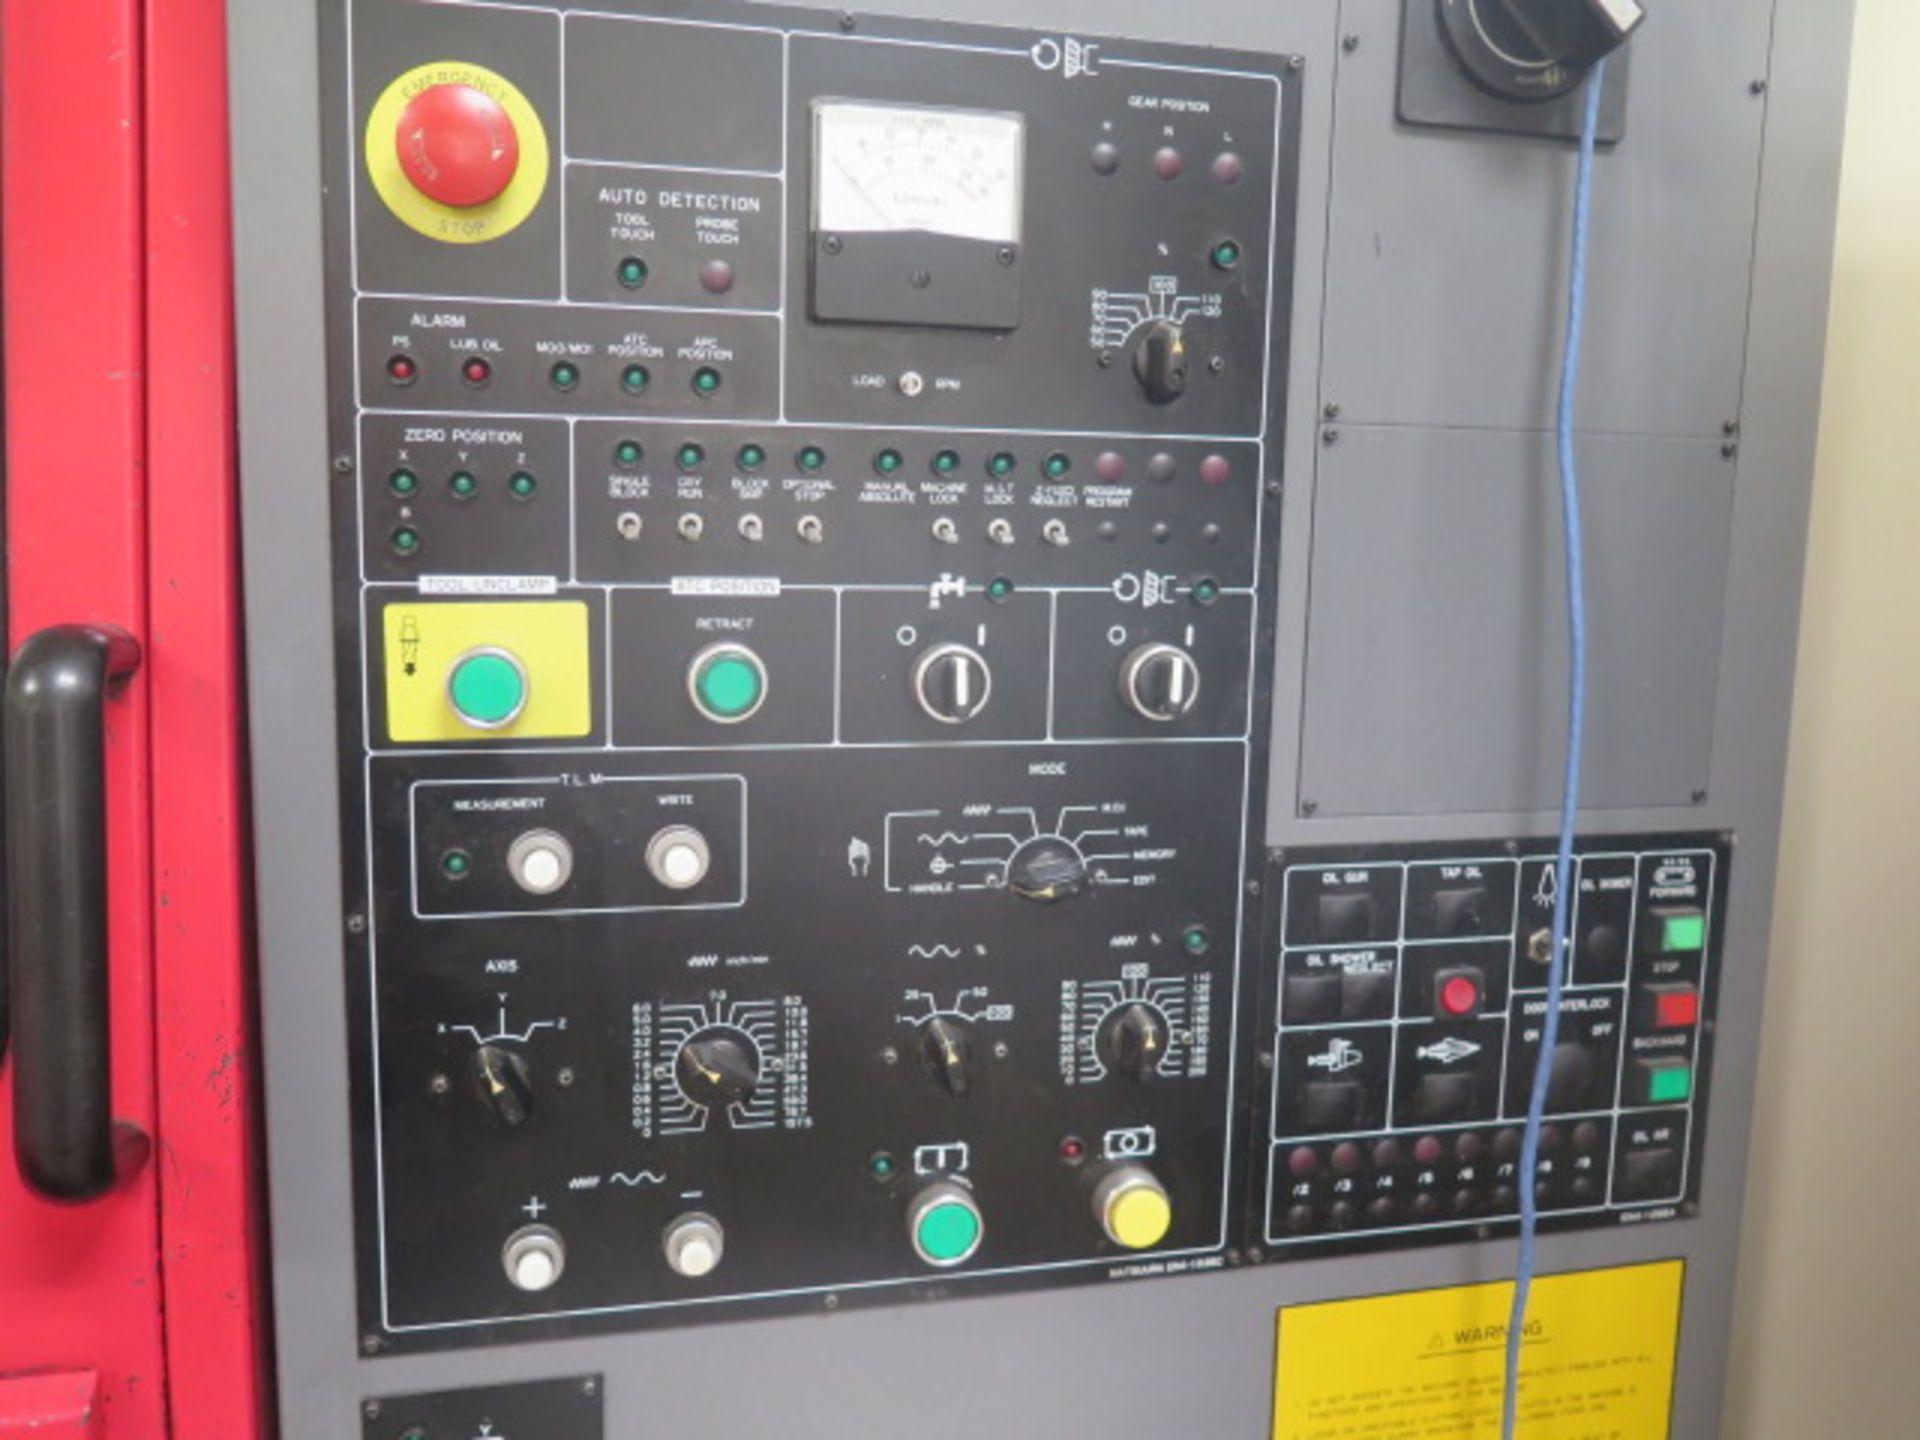 1992 Matsuura MC-450H-30-PC II 10-Pallet CNC Horizontal Machining Center s/n 910609609, SOLD AS IS - Image 7 of 23